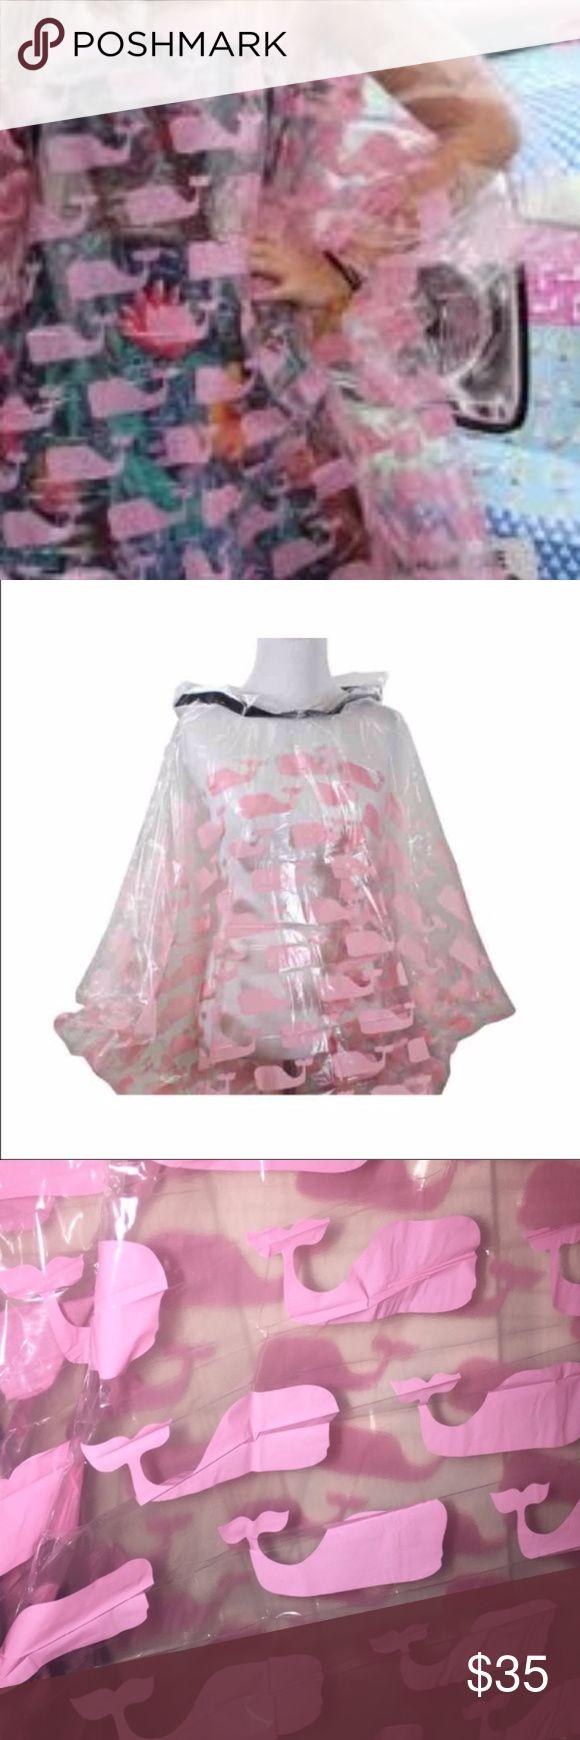 Vineyard Vines Rain Poncho Plastic poncho with pink whale print- NIB Vineyard Vines Jackets & Coats Capes